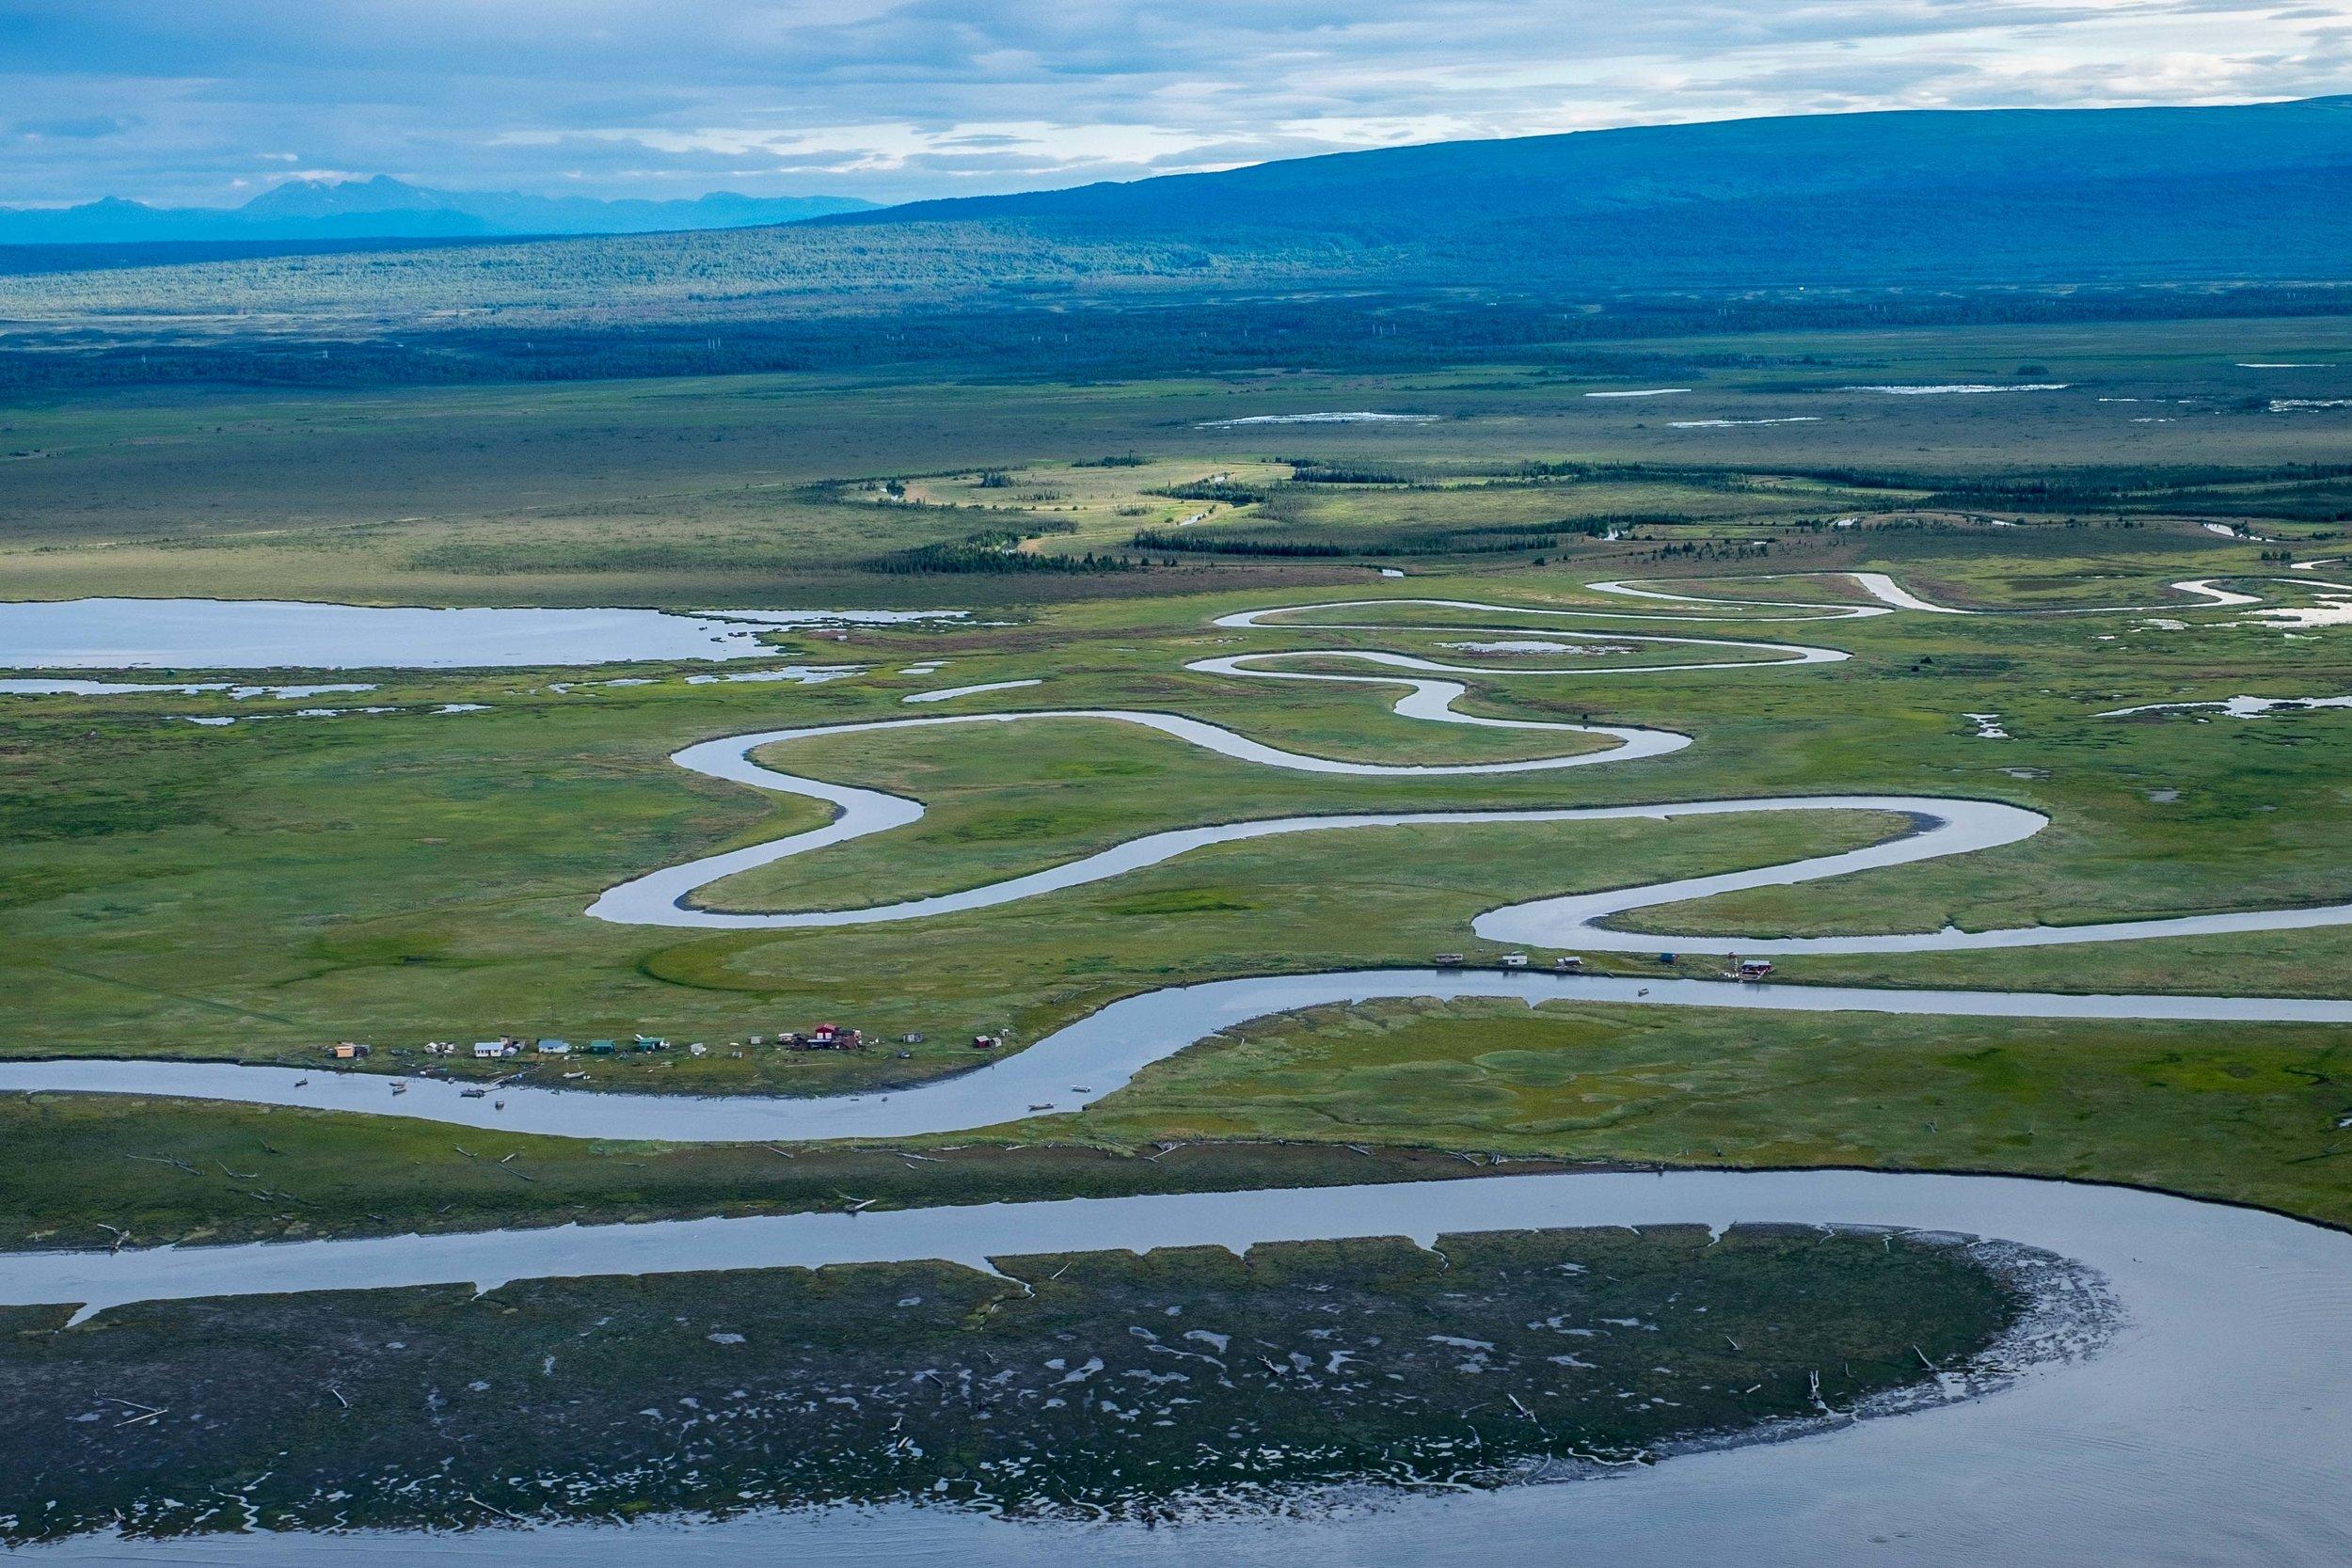 20160720-JI-Katmai National Park-_DSF2297-2.jpg